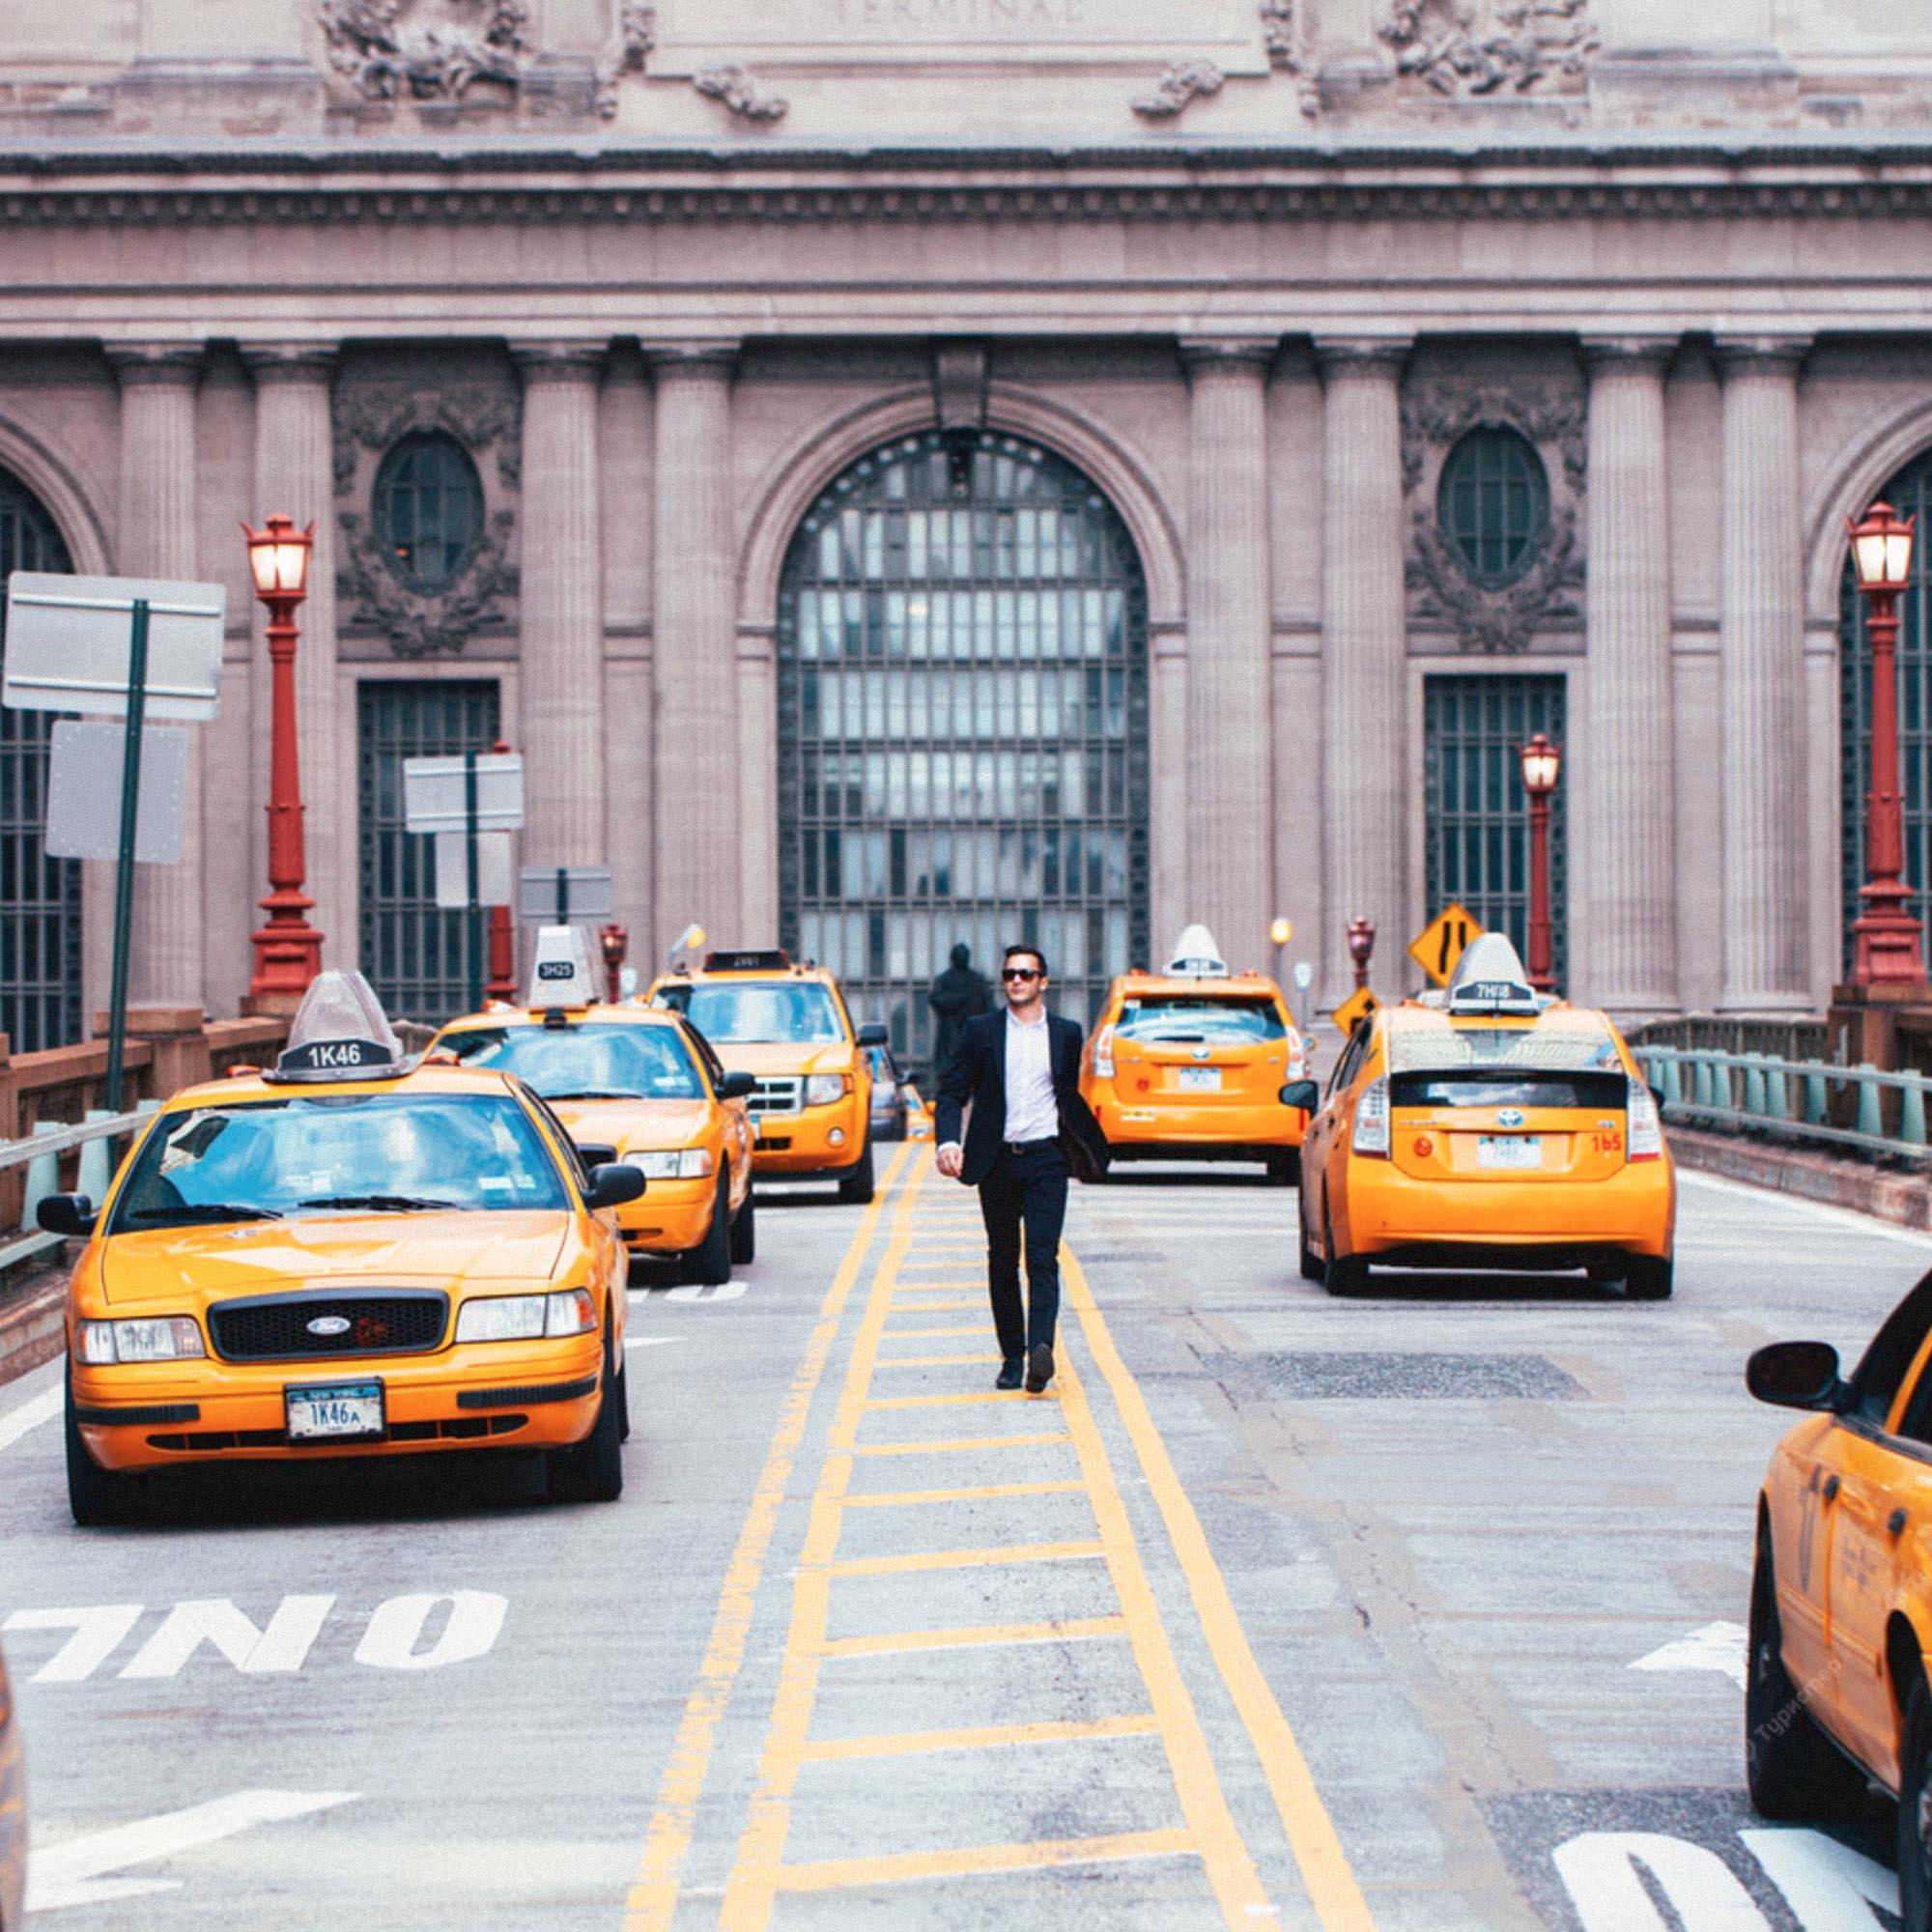 nyc-photographers-NYC-Tour-PHOTOSHOOT-100188.jpg